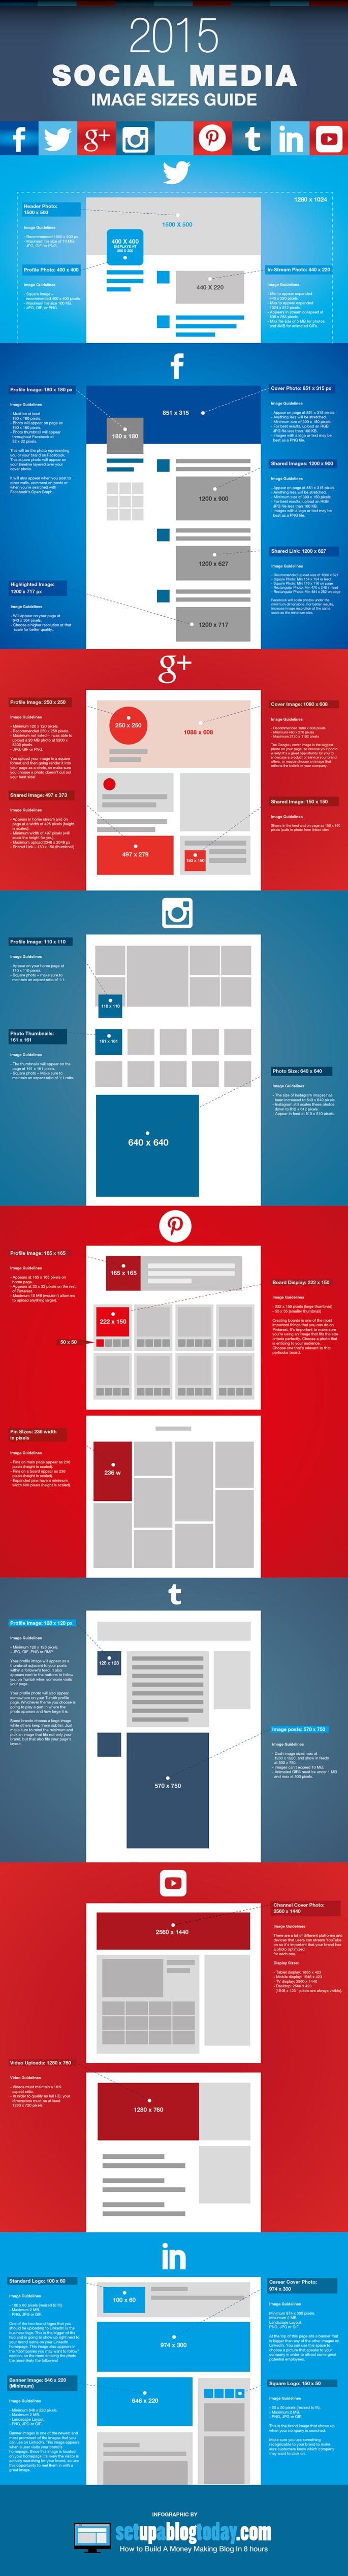 social-media-image-sizes-marketing-design-2015-infographic